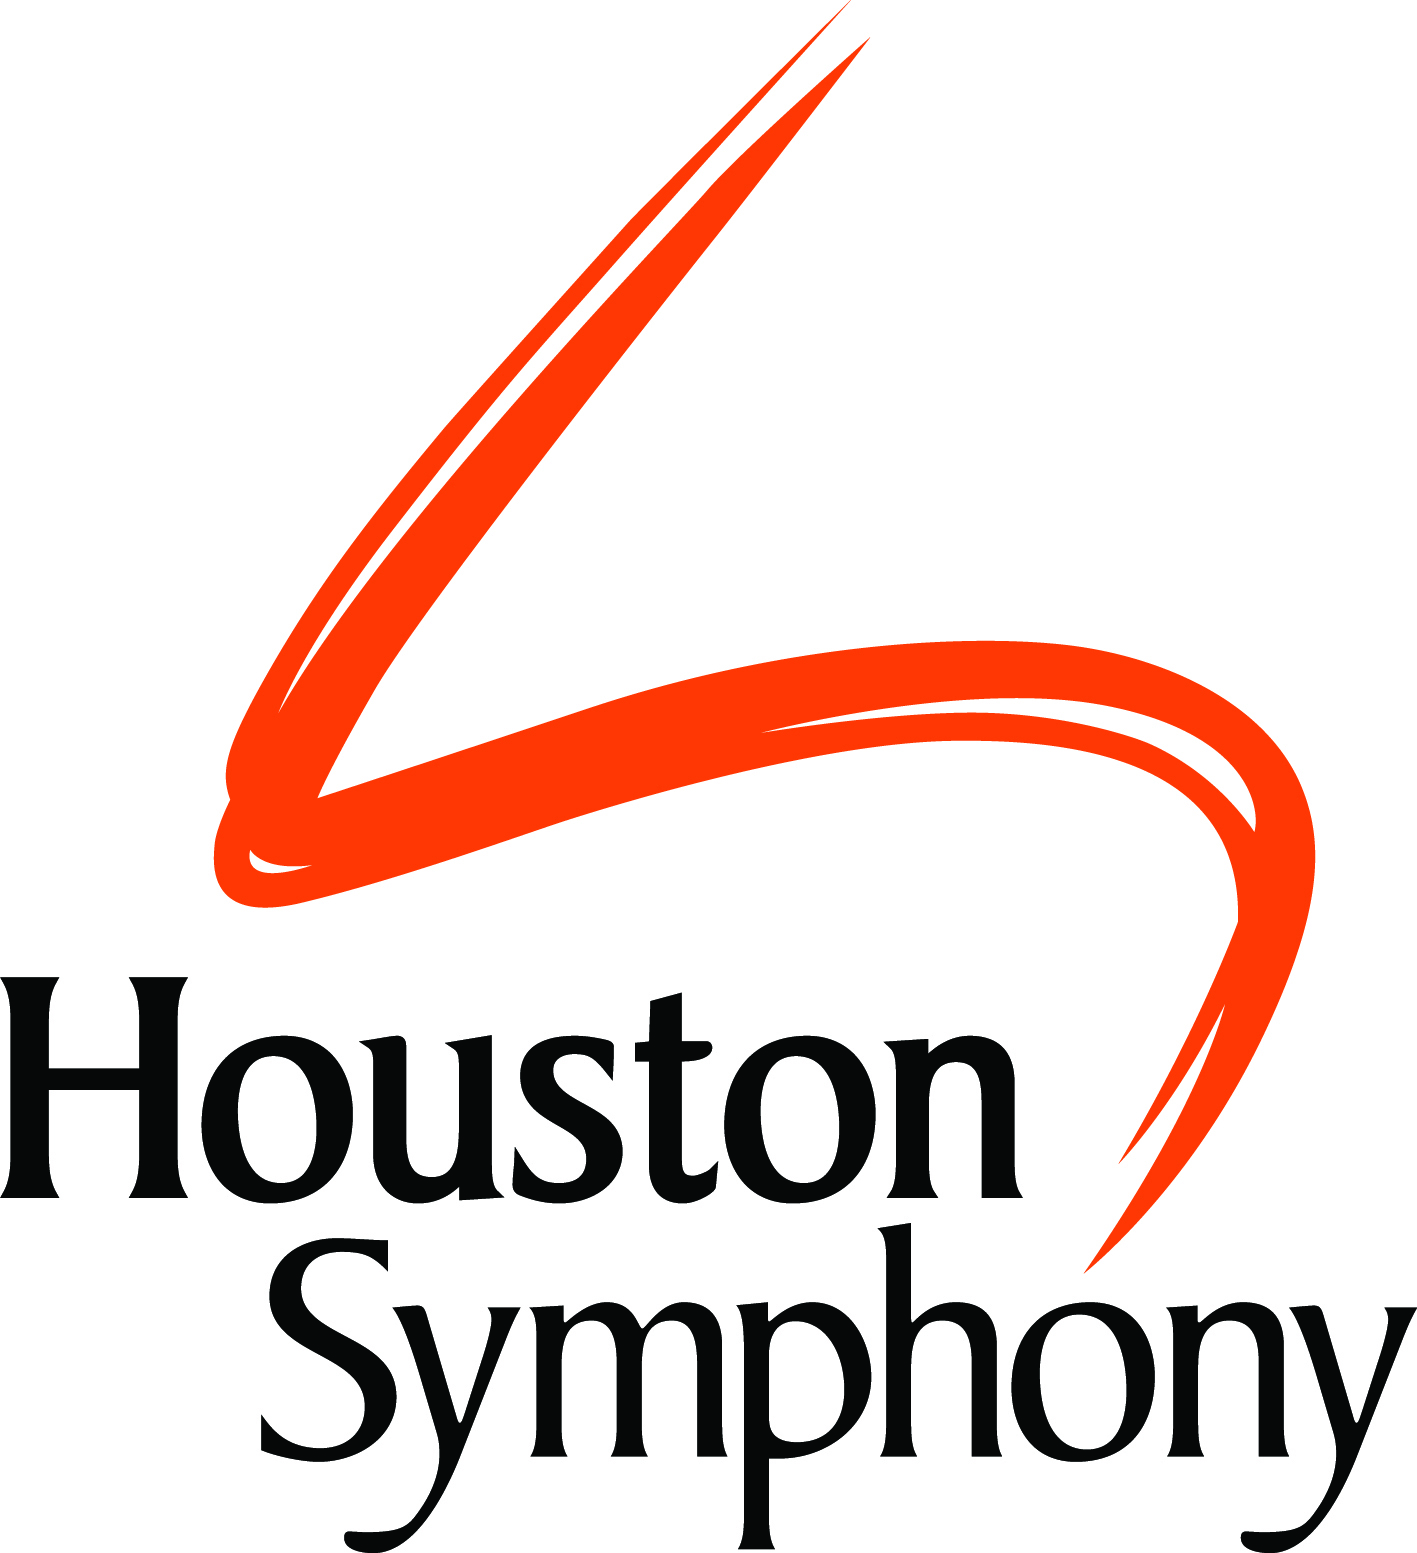 Houston Symphony Orchestra